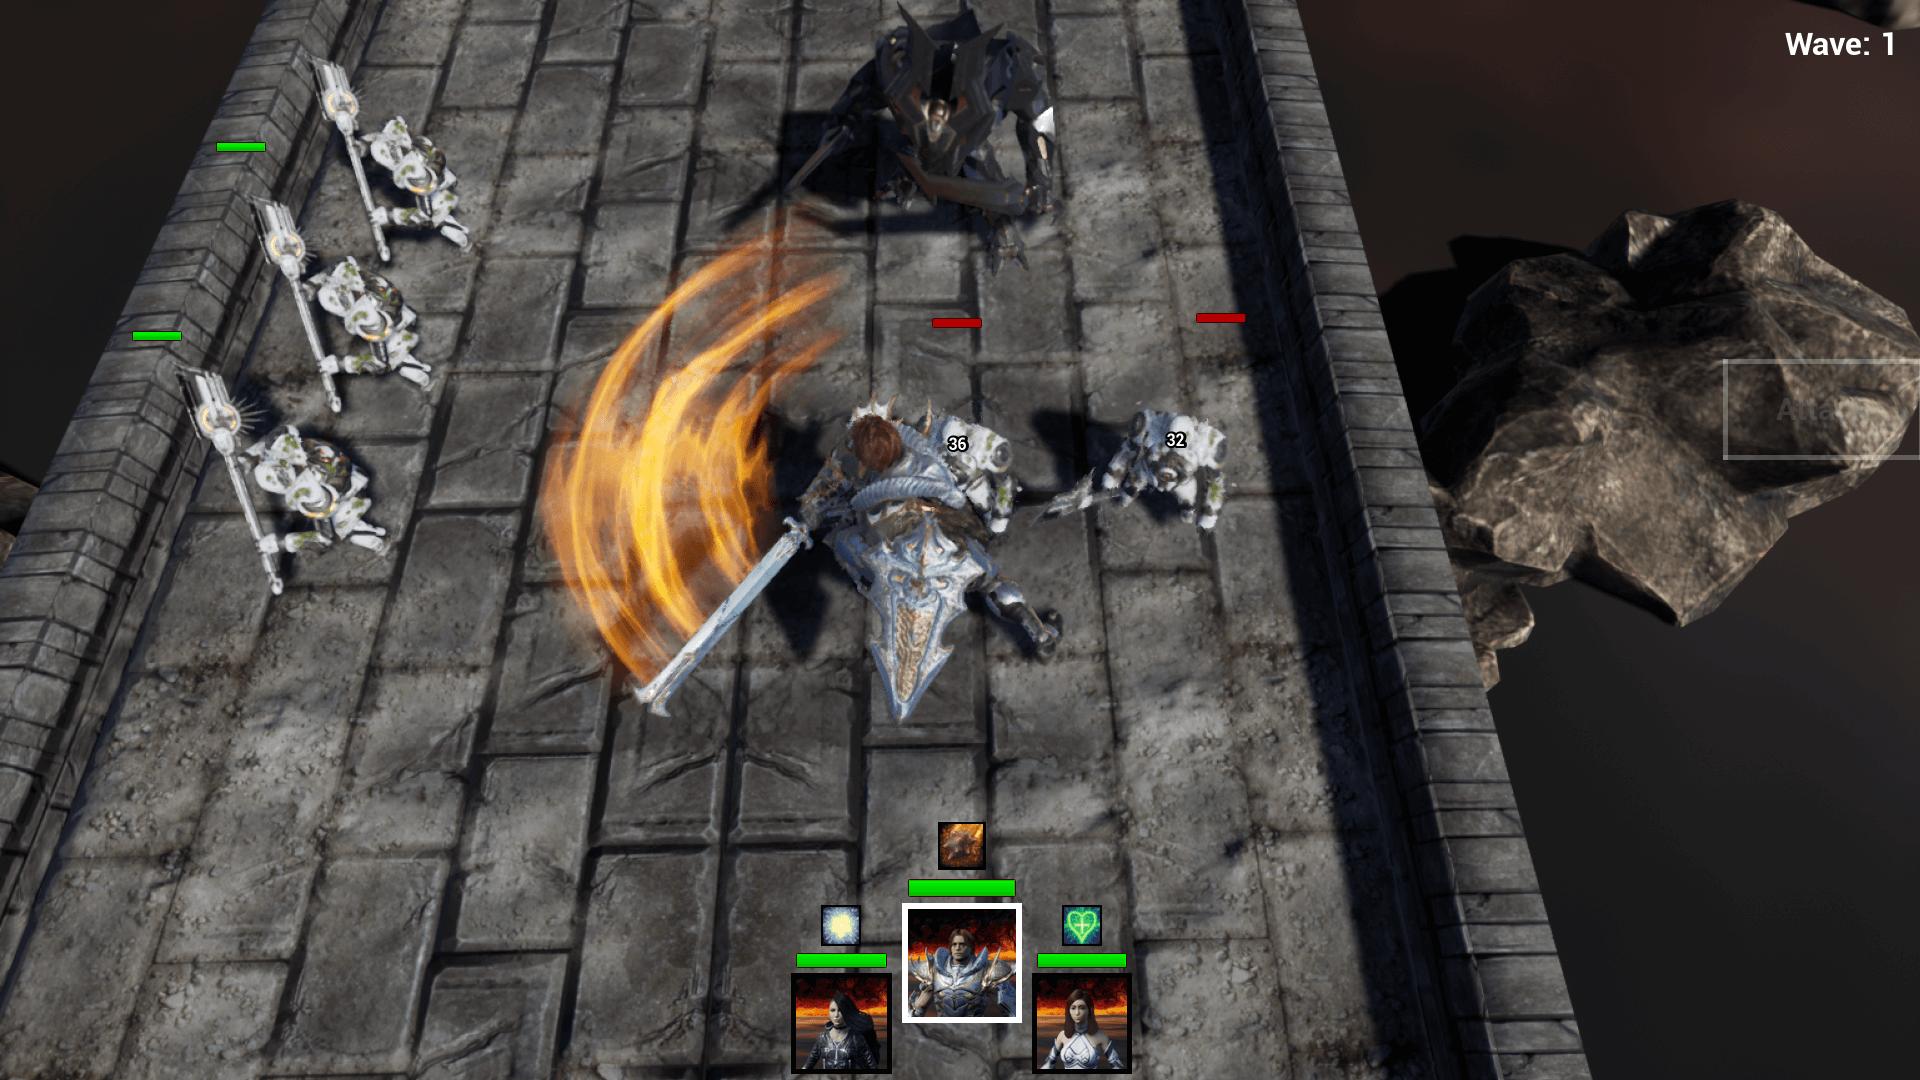 Turn-Based RPG Template by PhoenixMarket in Blueprints - UE4 Marketplace